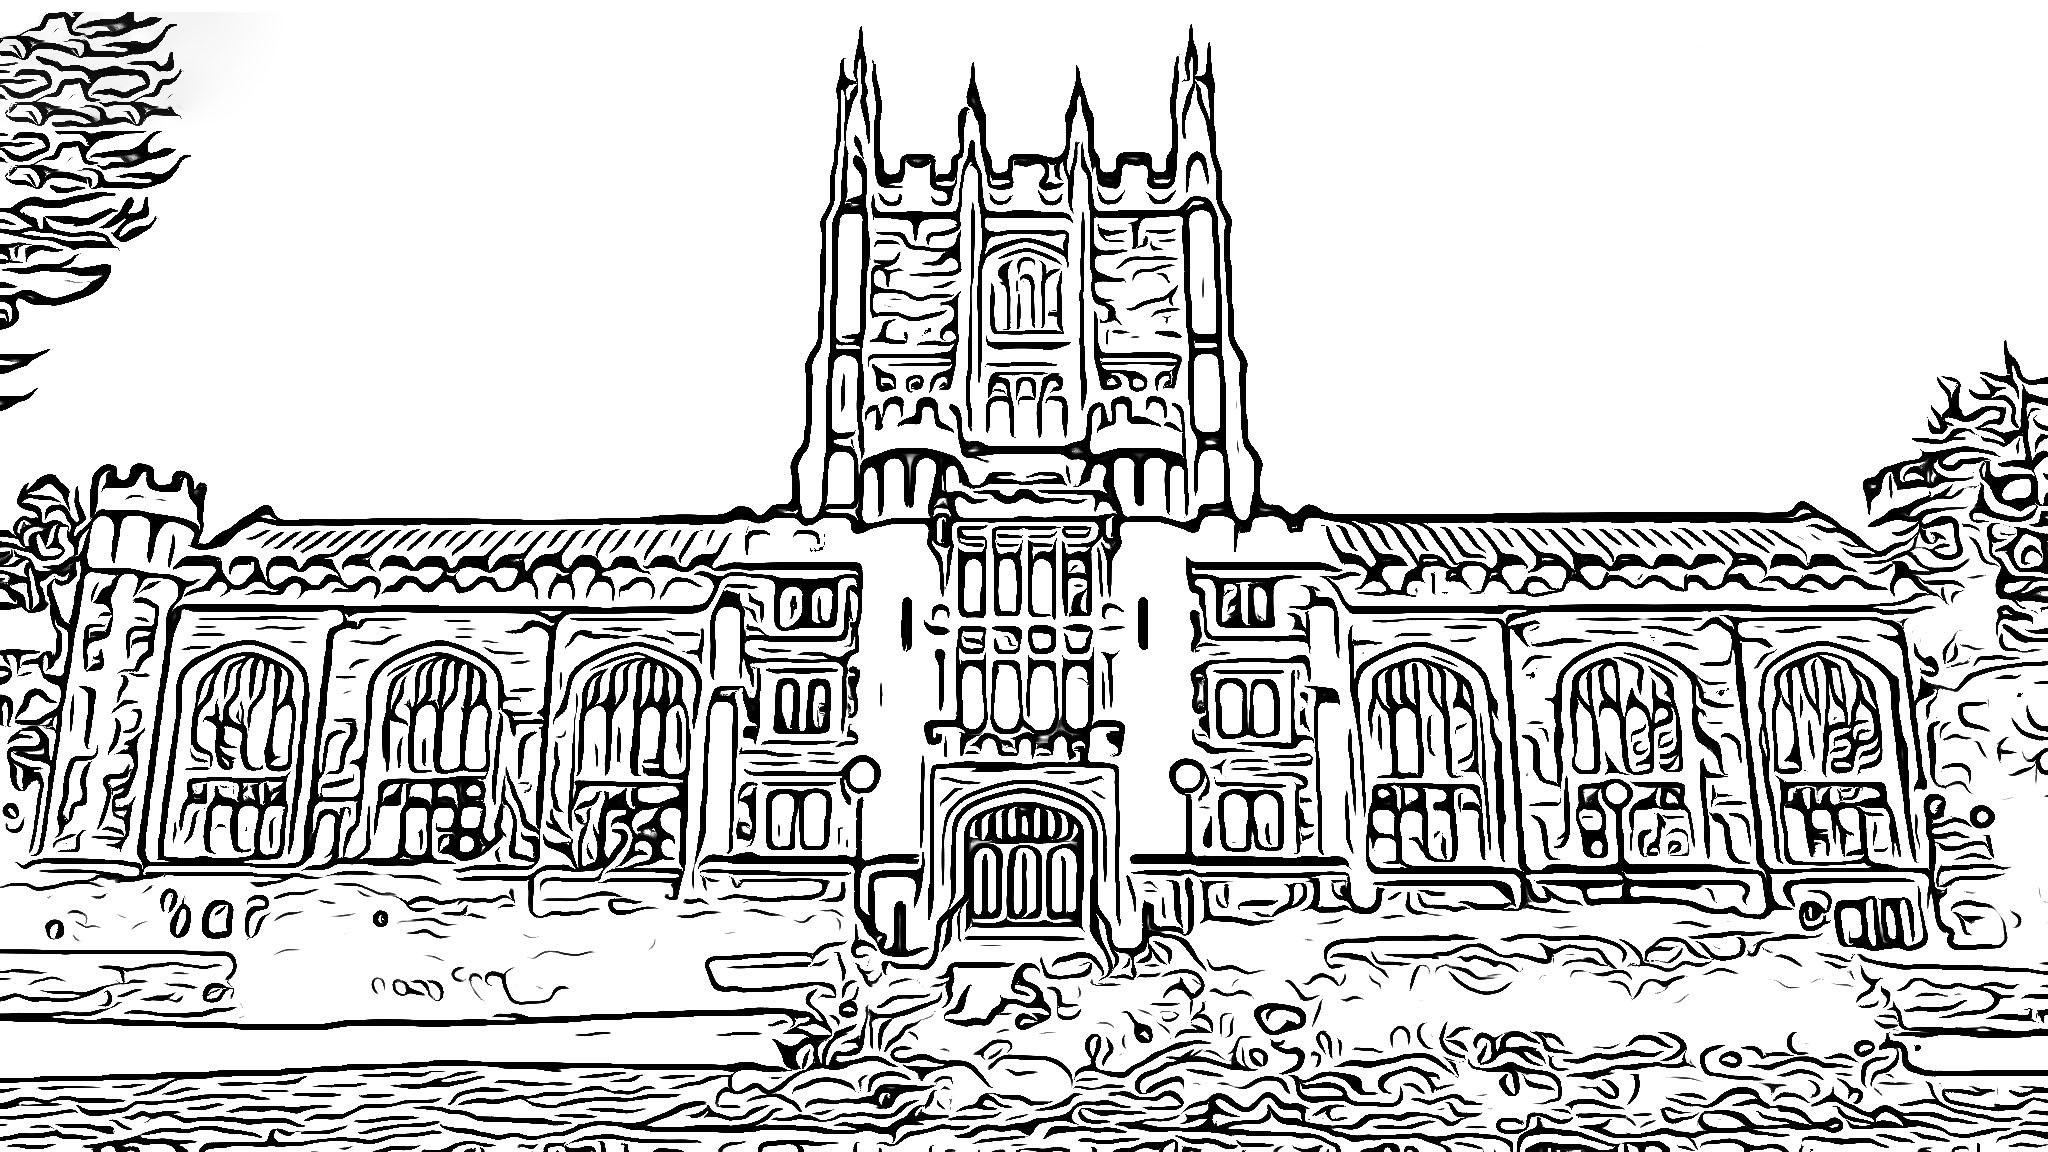 Vassar College Main (Thompkins) Library